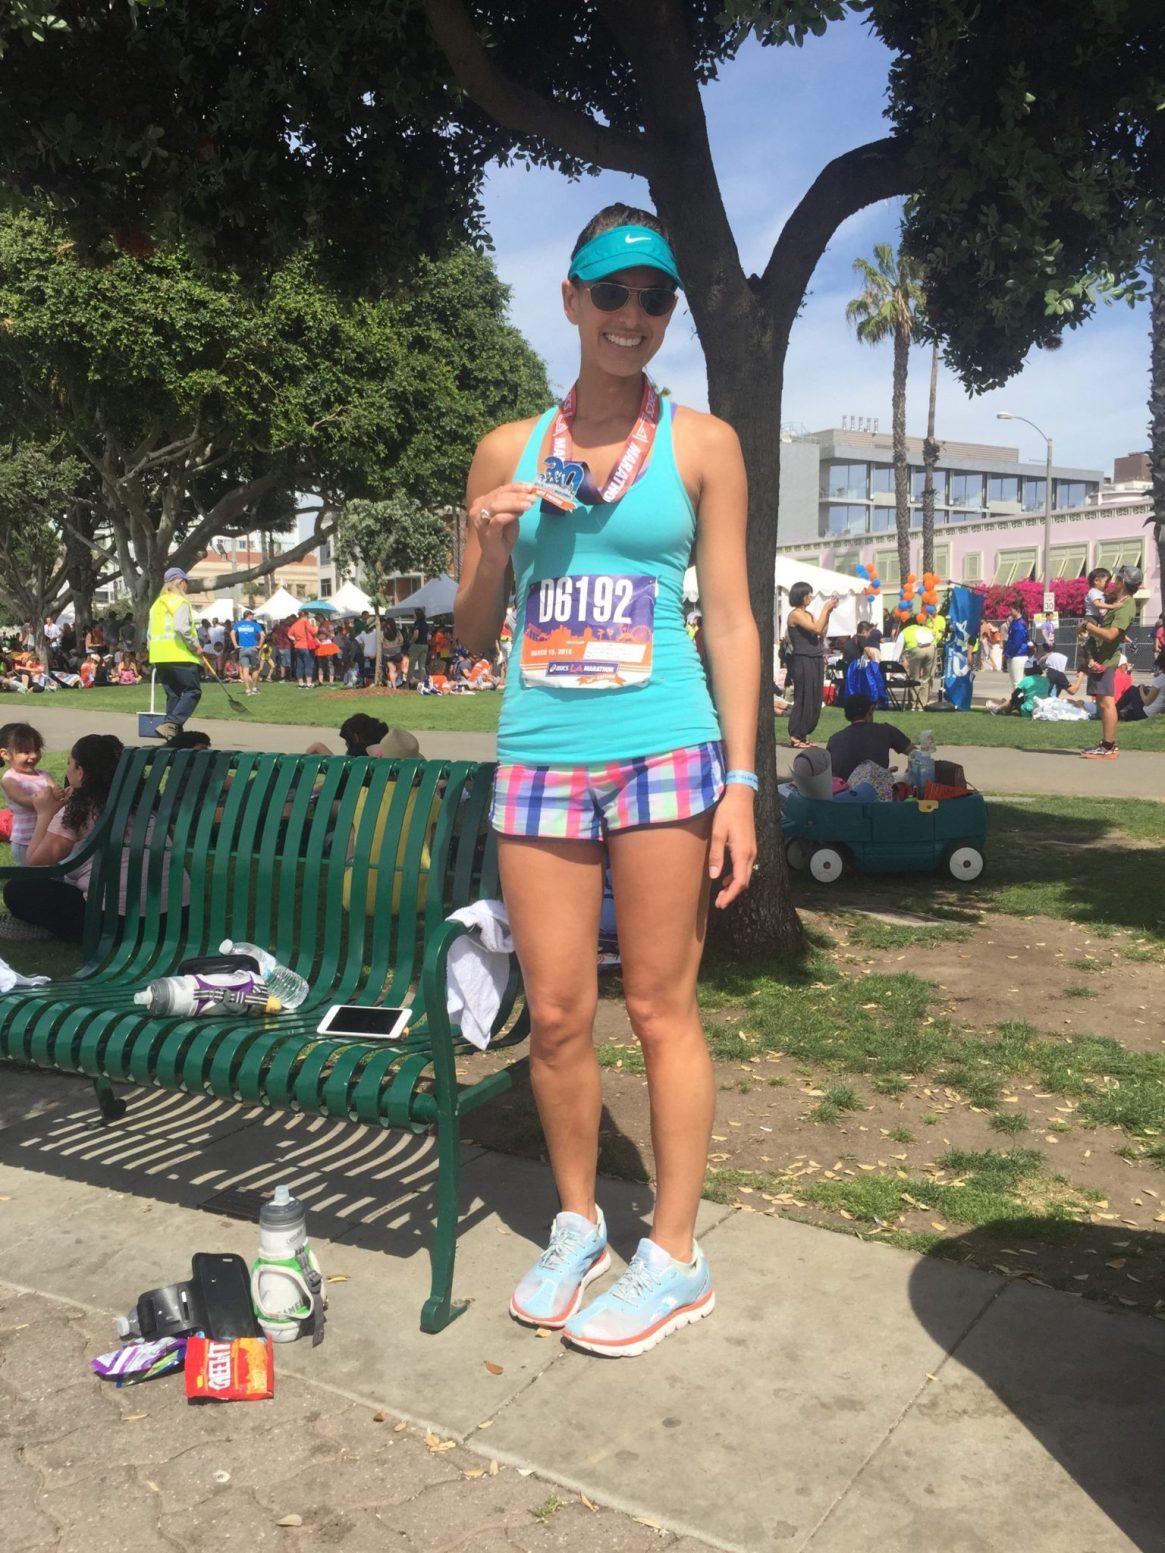 LA Marathon, Los Angeles, California, Marathon, 30th anniversary, lululemon, altra running, medal